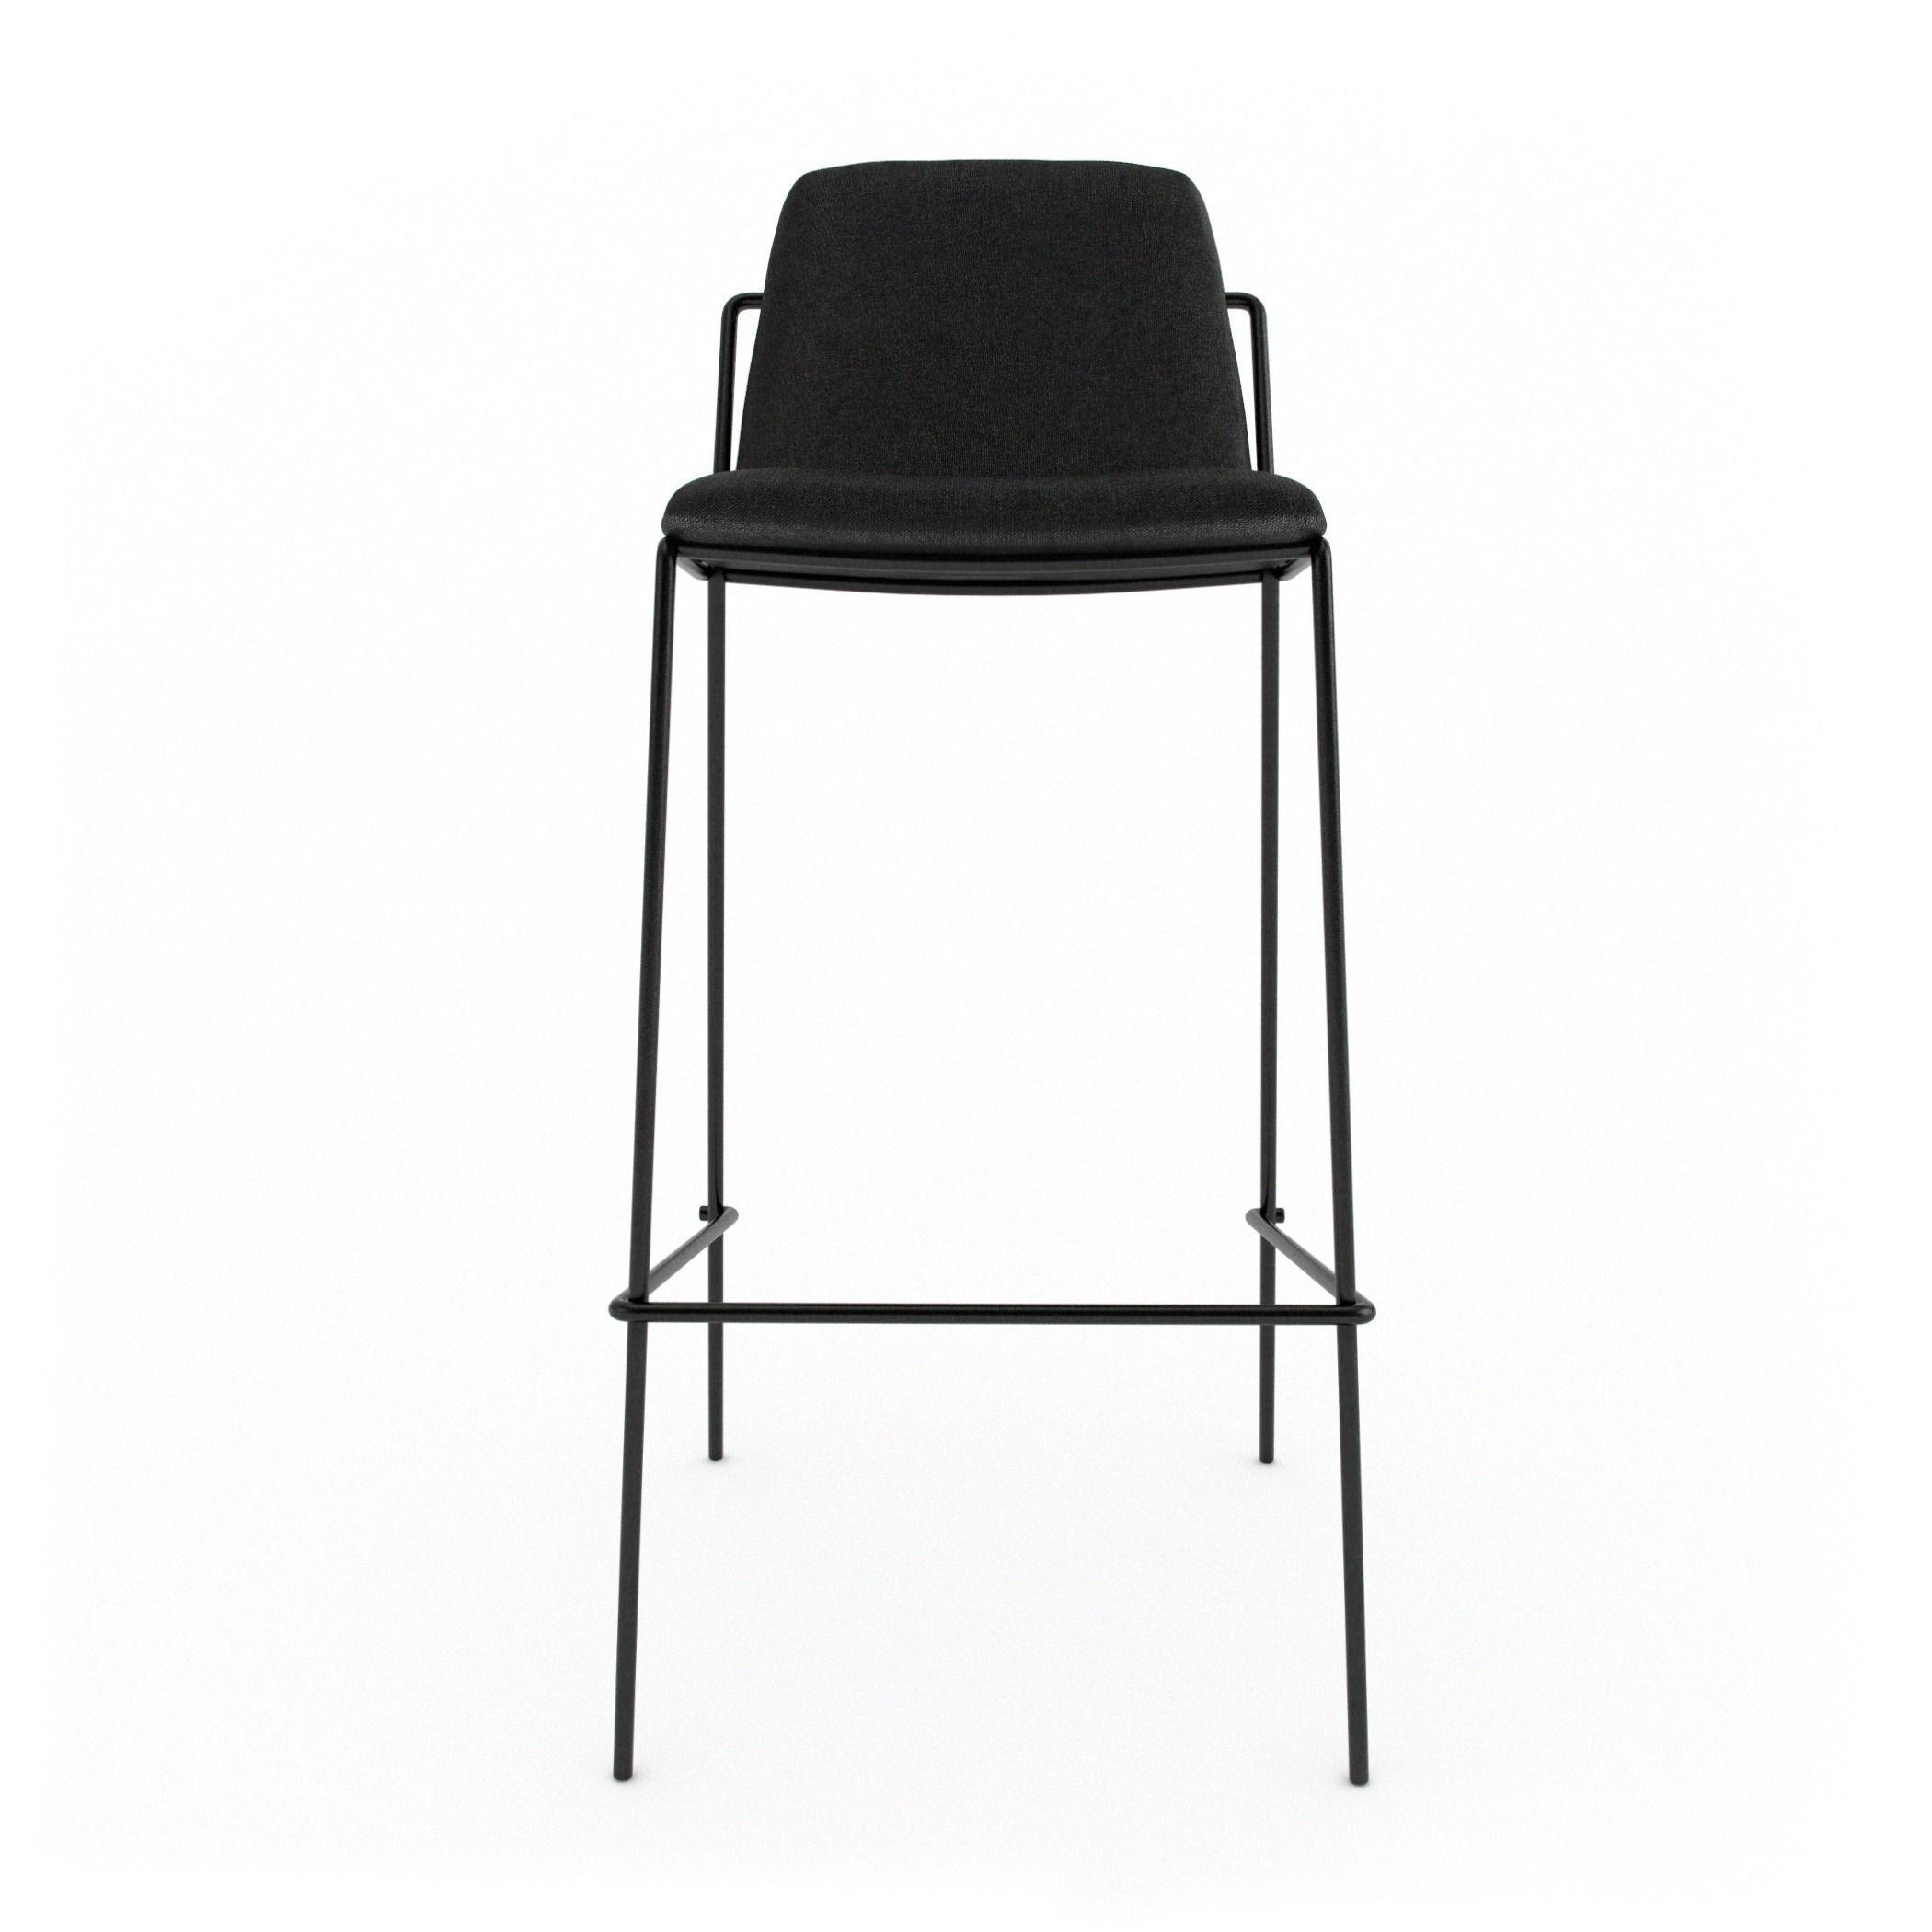 Astonishing Industry West Sling Bar Stool Upholstered 3D Model Machost Co Dining Chair Design Ideas Machostcouk